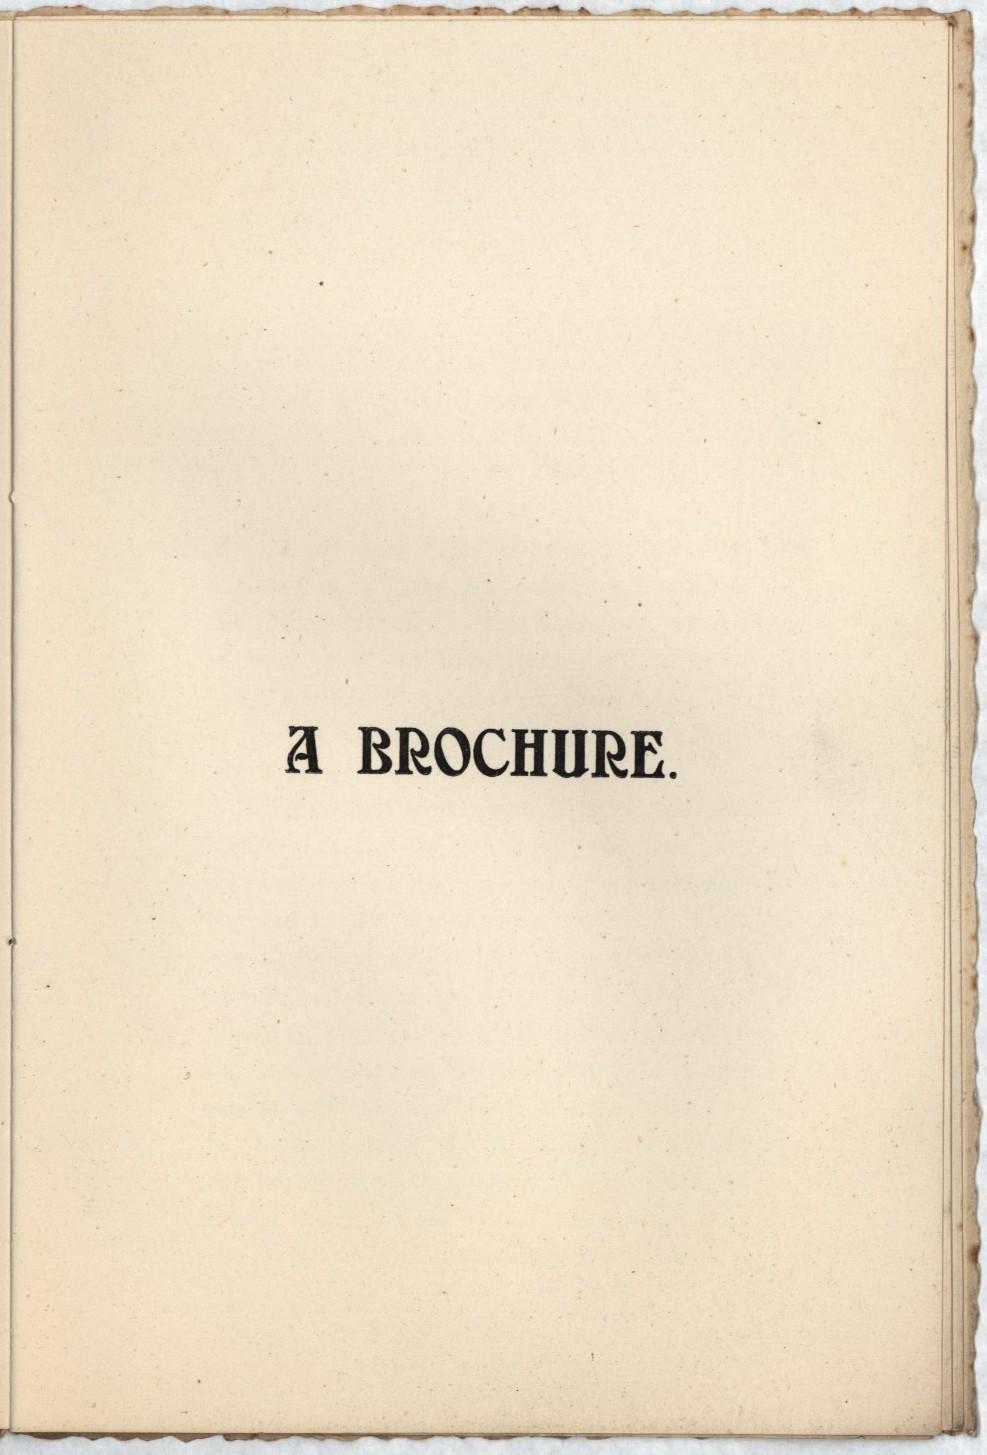 EMW-2-1-1 Brochure title page